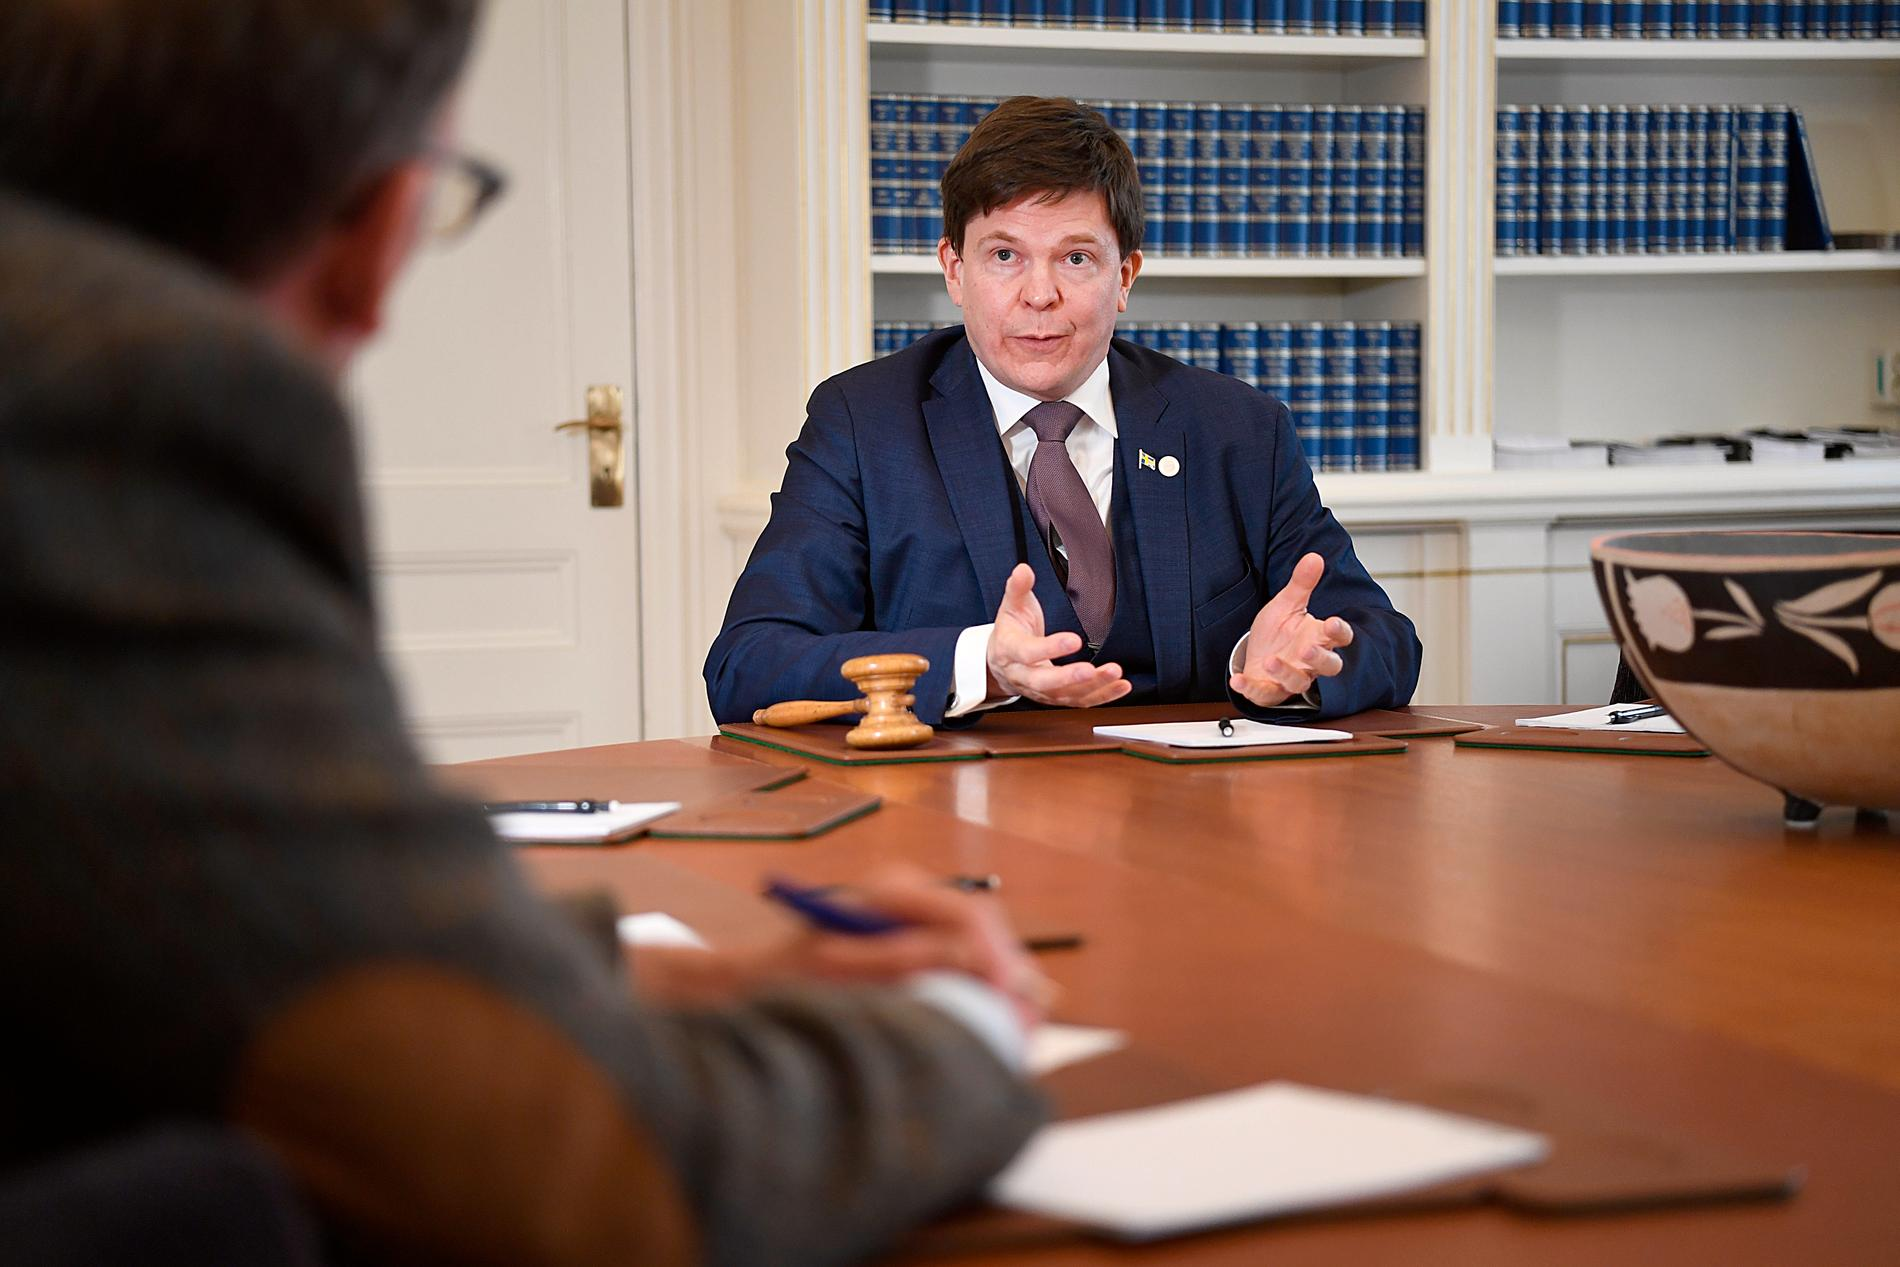 Oisín Cantwell intervjuar riksdagens talman Andreas Norlén.